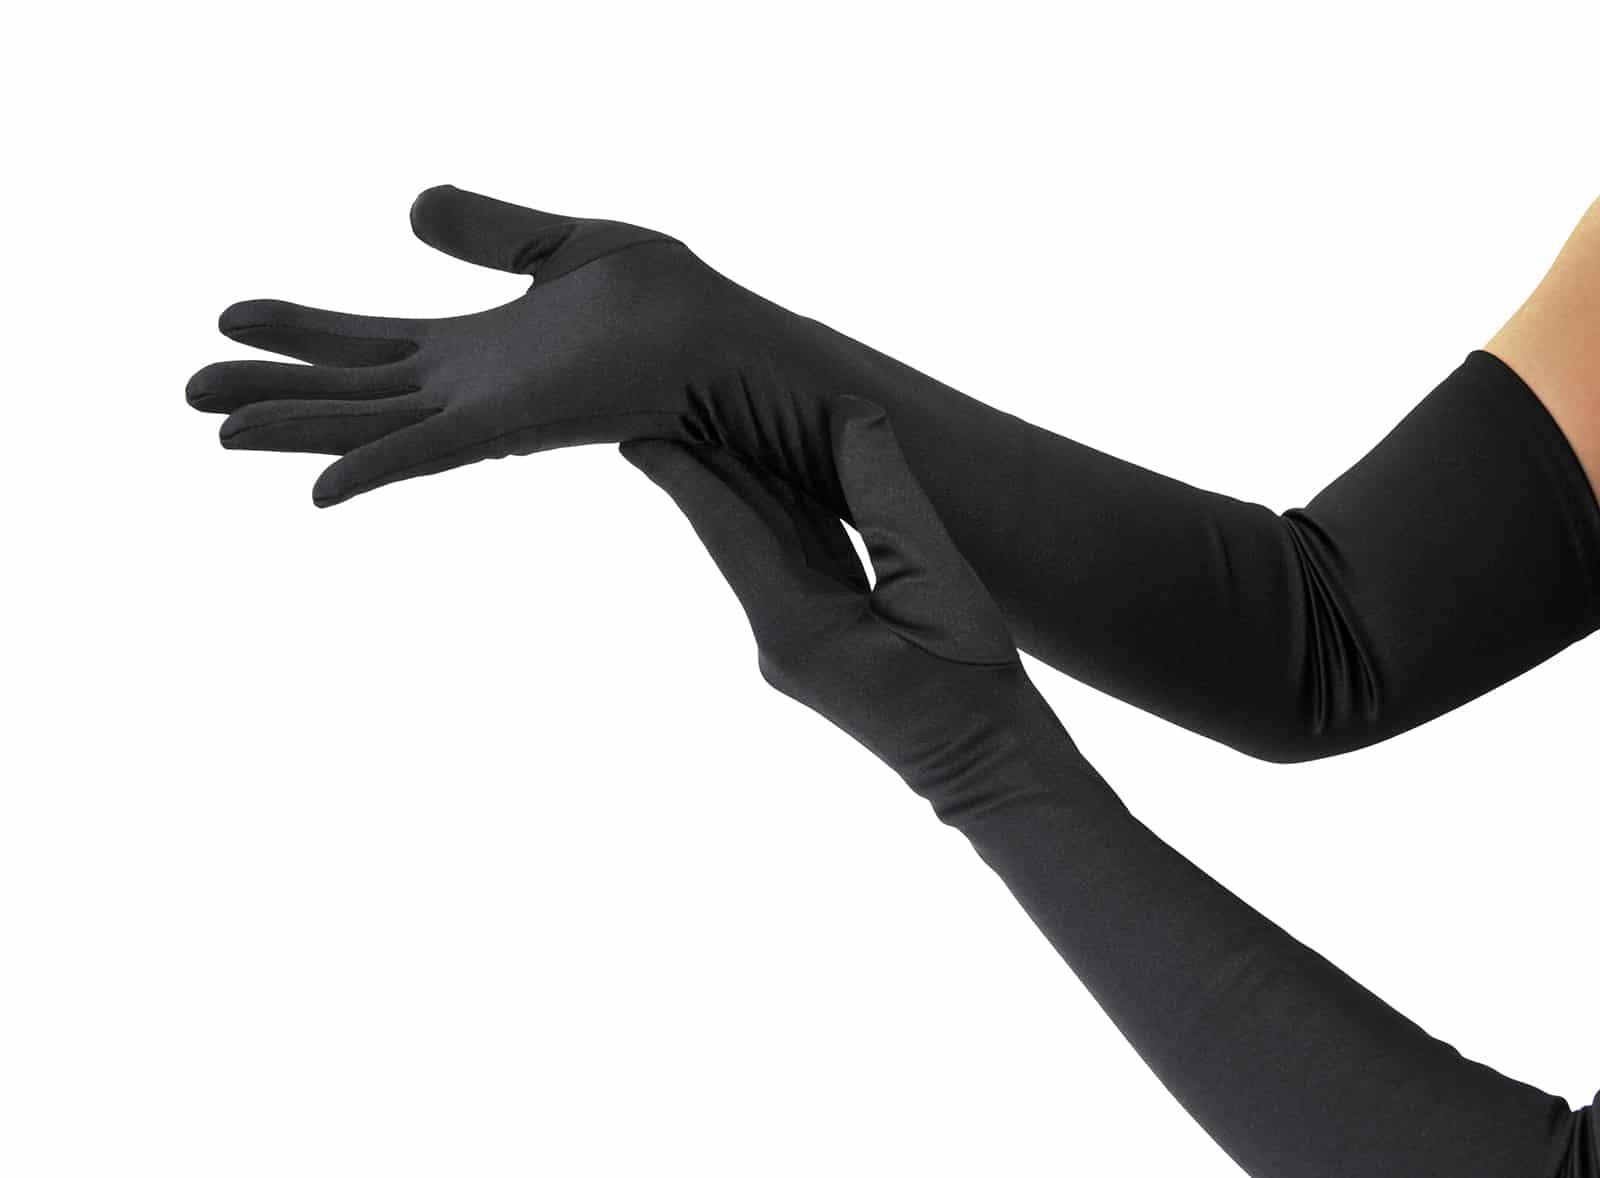 sarung tangan gara-gara covid-19